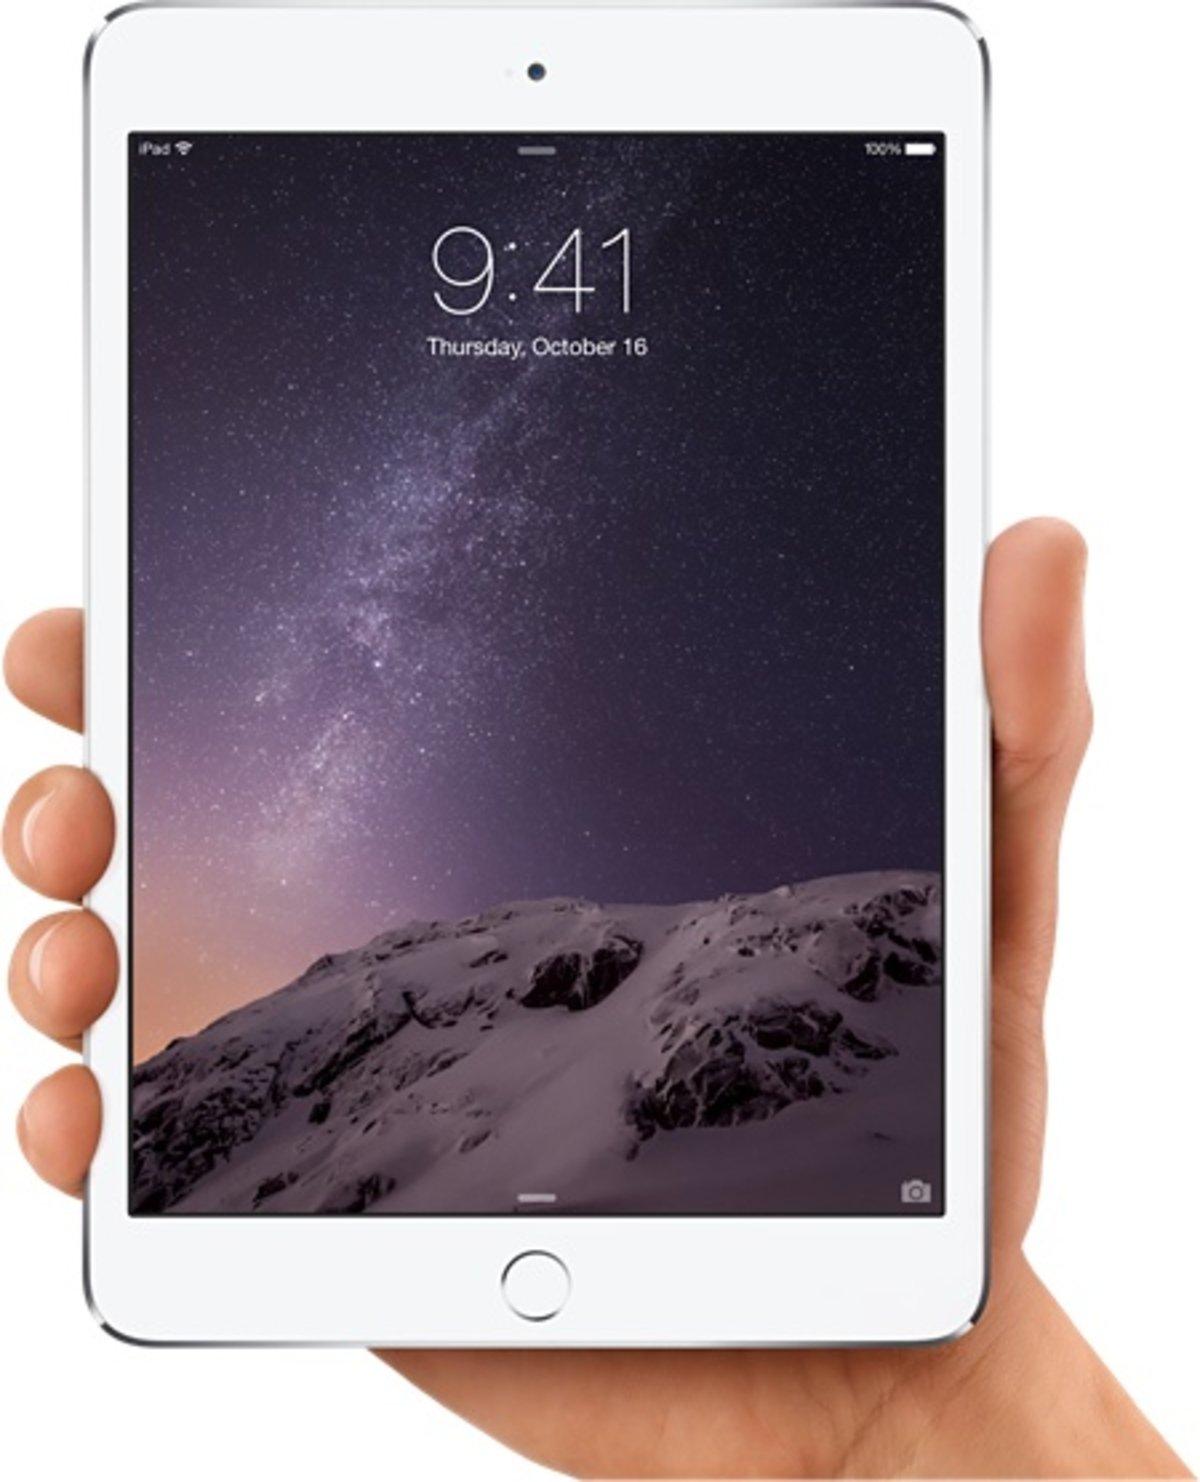 ios-8-mejorar-rendimiento-ipad-iphone-4